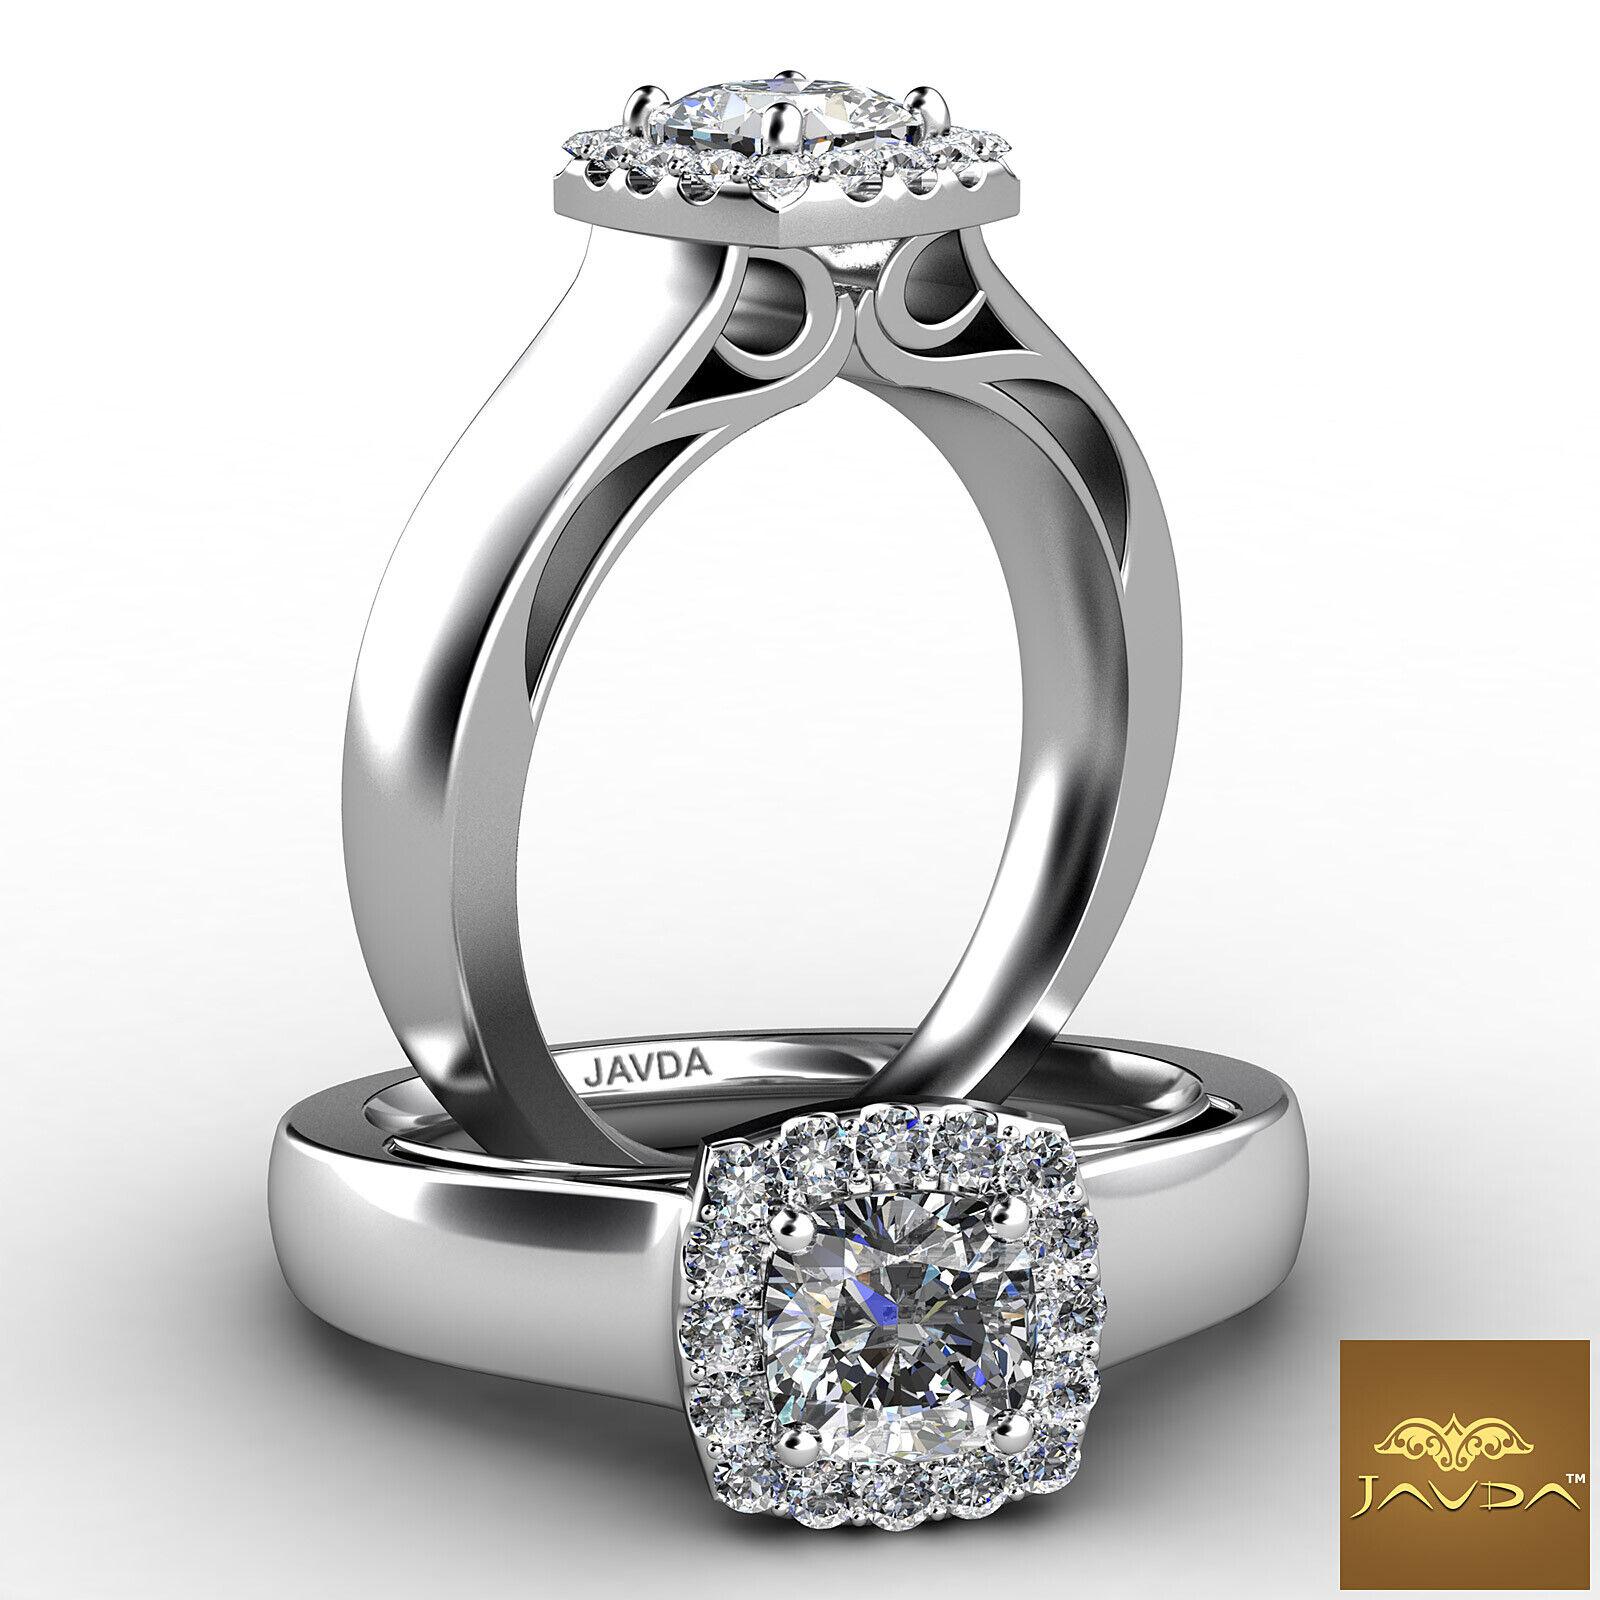 Filigree Shank U Cut Prong Cushion Diamond Engagement GIA H Color VS1 Ring 0.7Ct